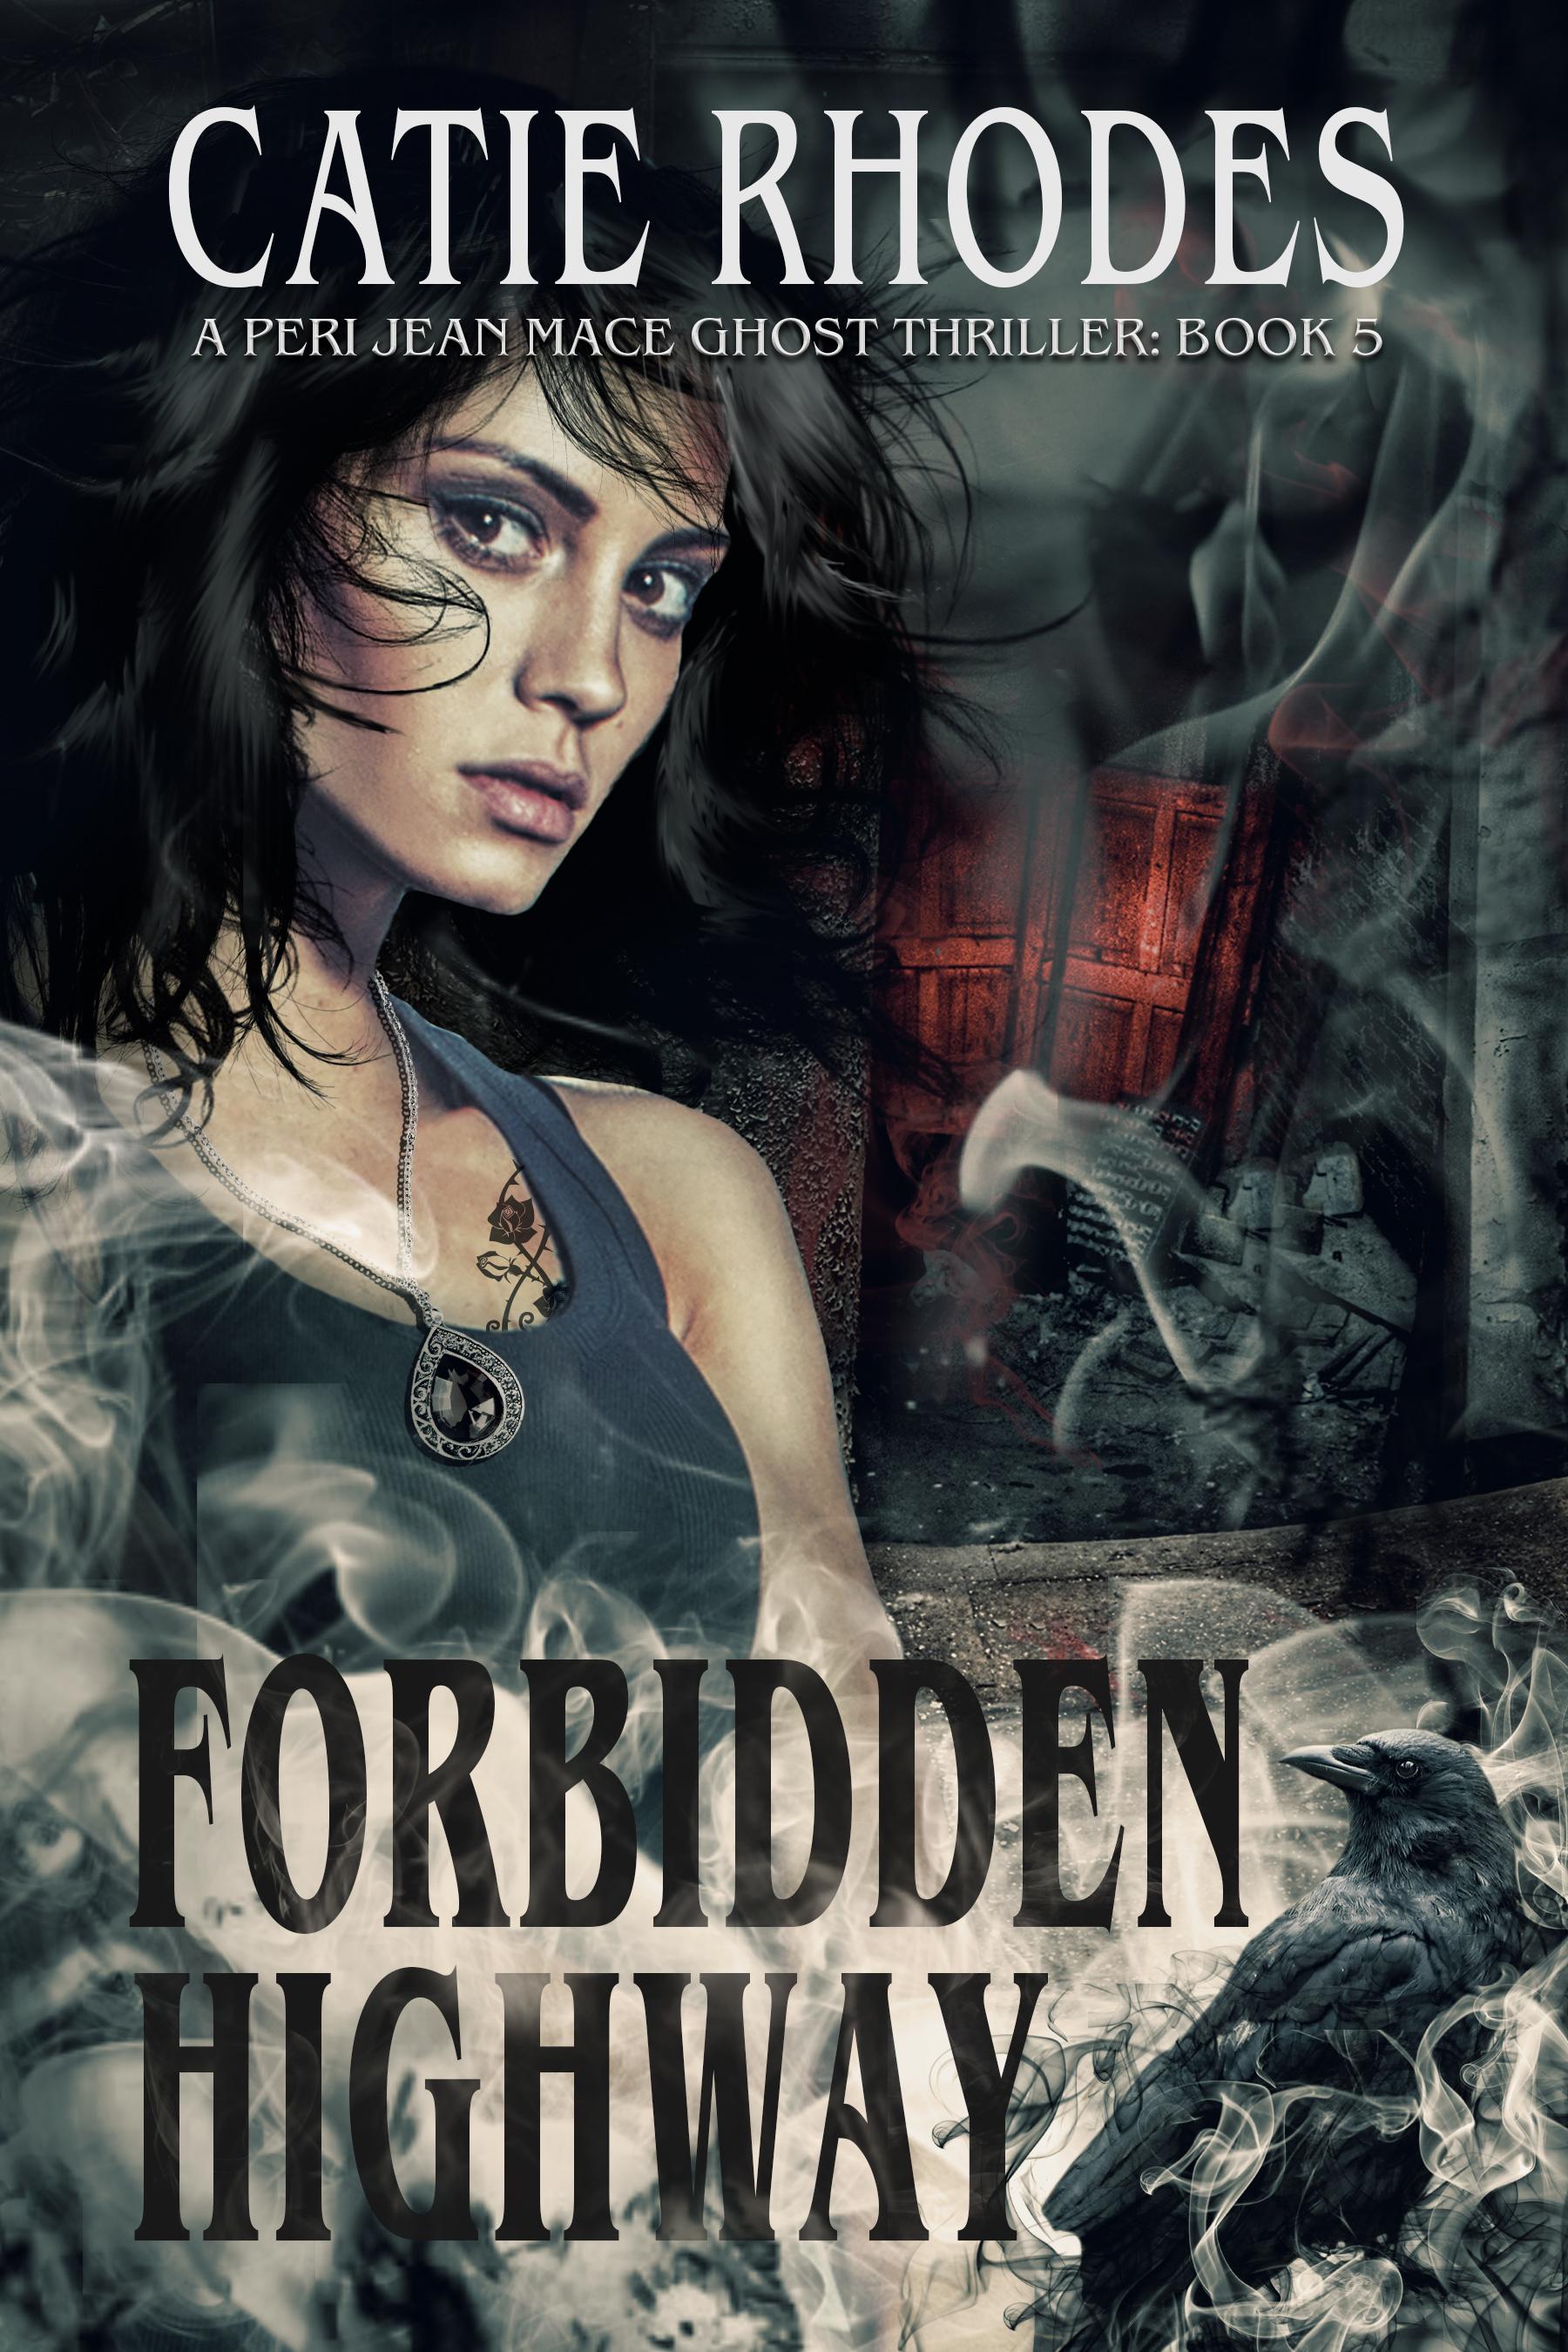 ForbiddenHighway